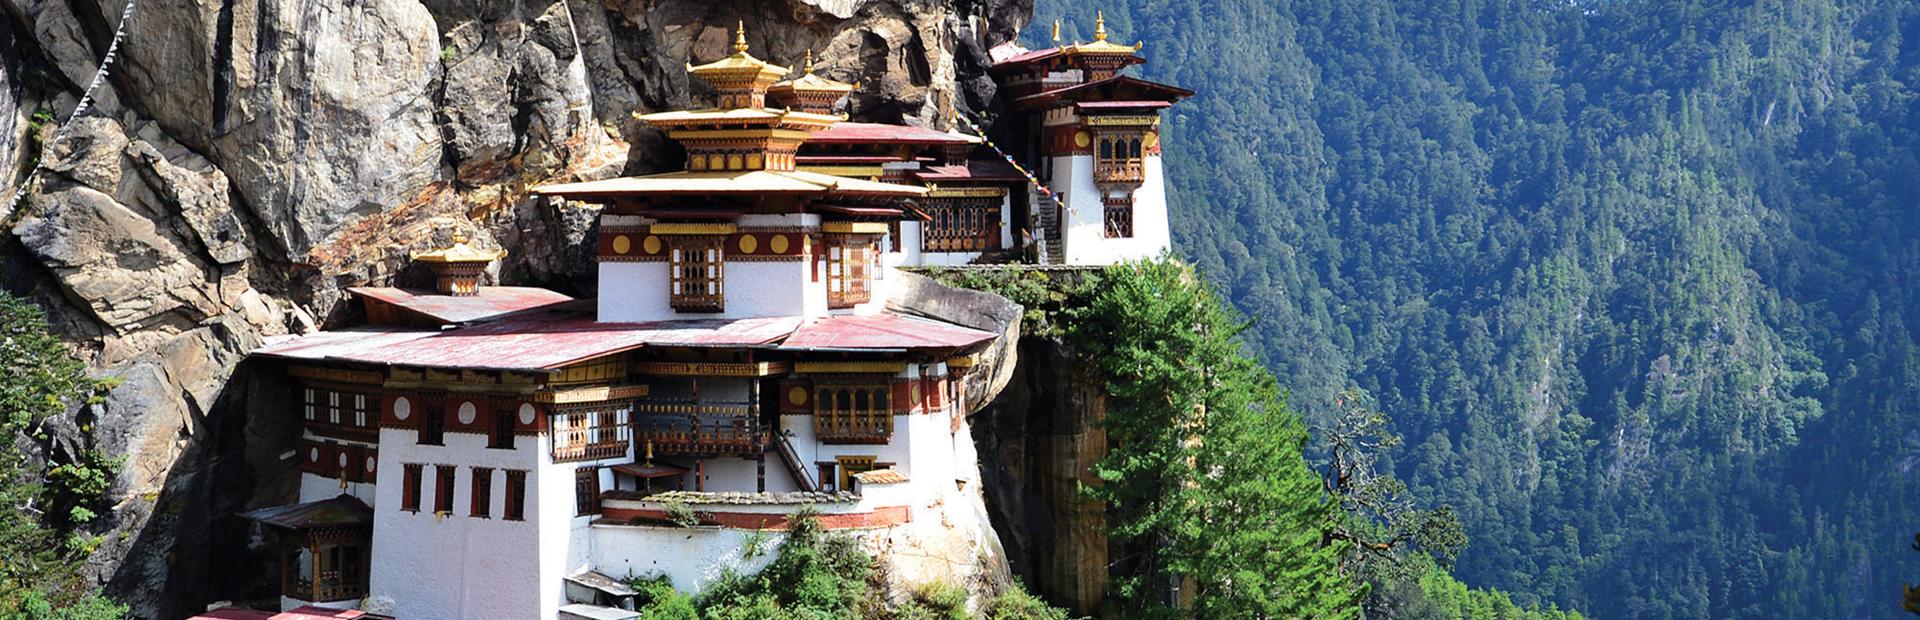 BHUTAN_Tour_1920x620